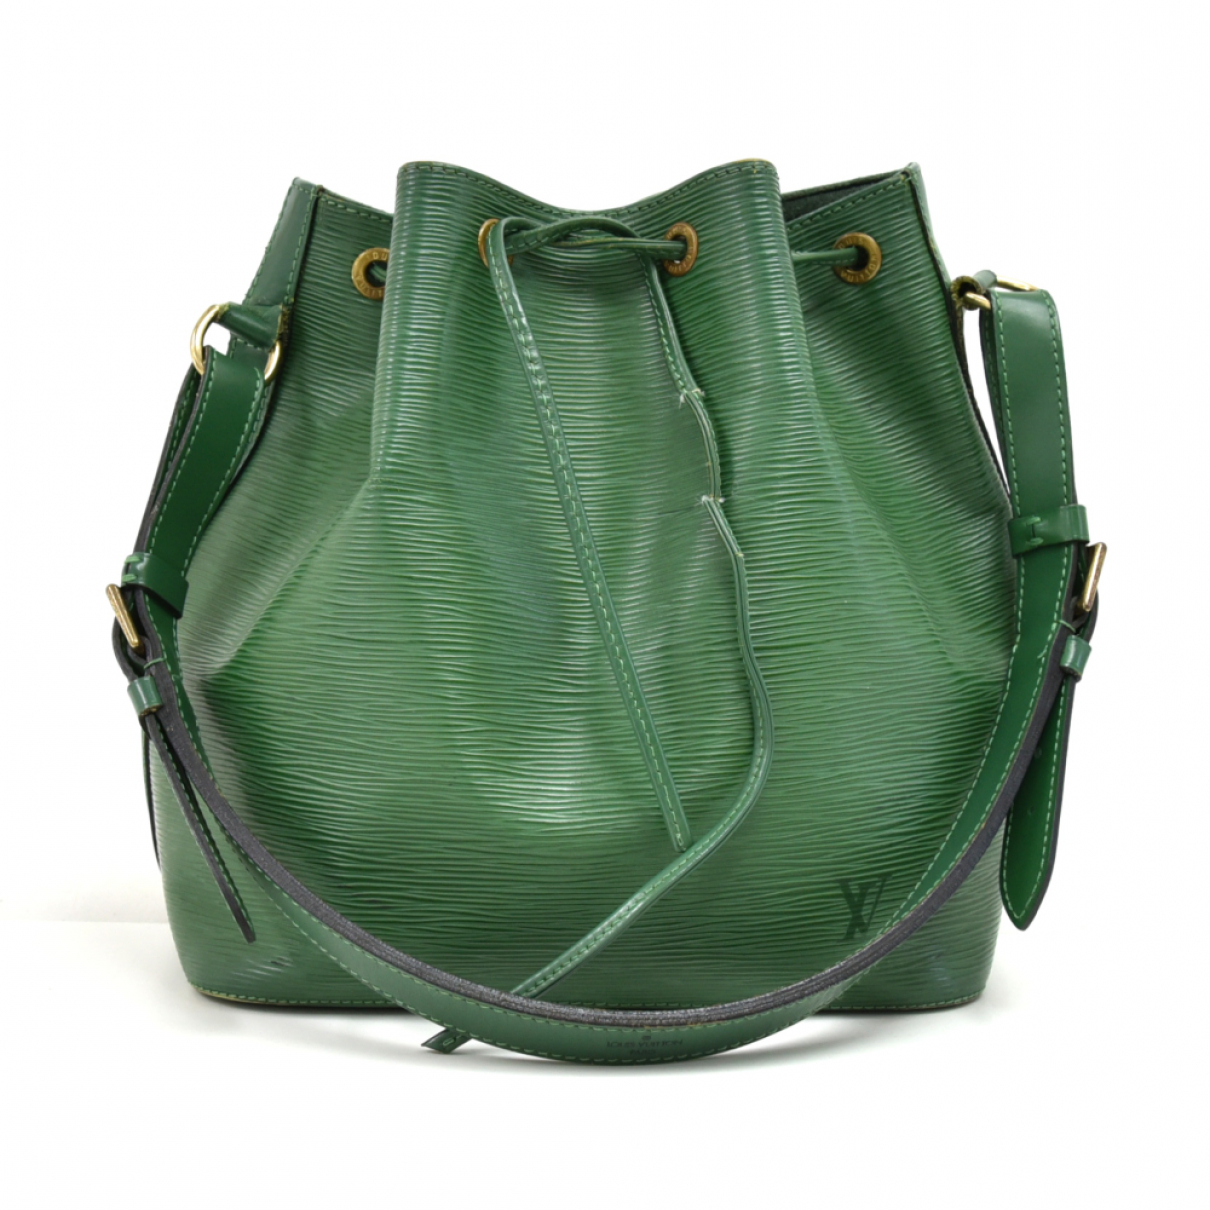 Louis Vuitton - Sac a main   pour femme en cuir - vert